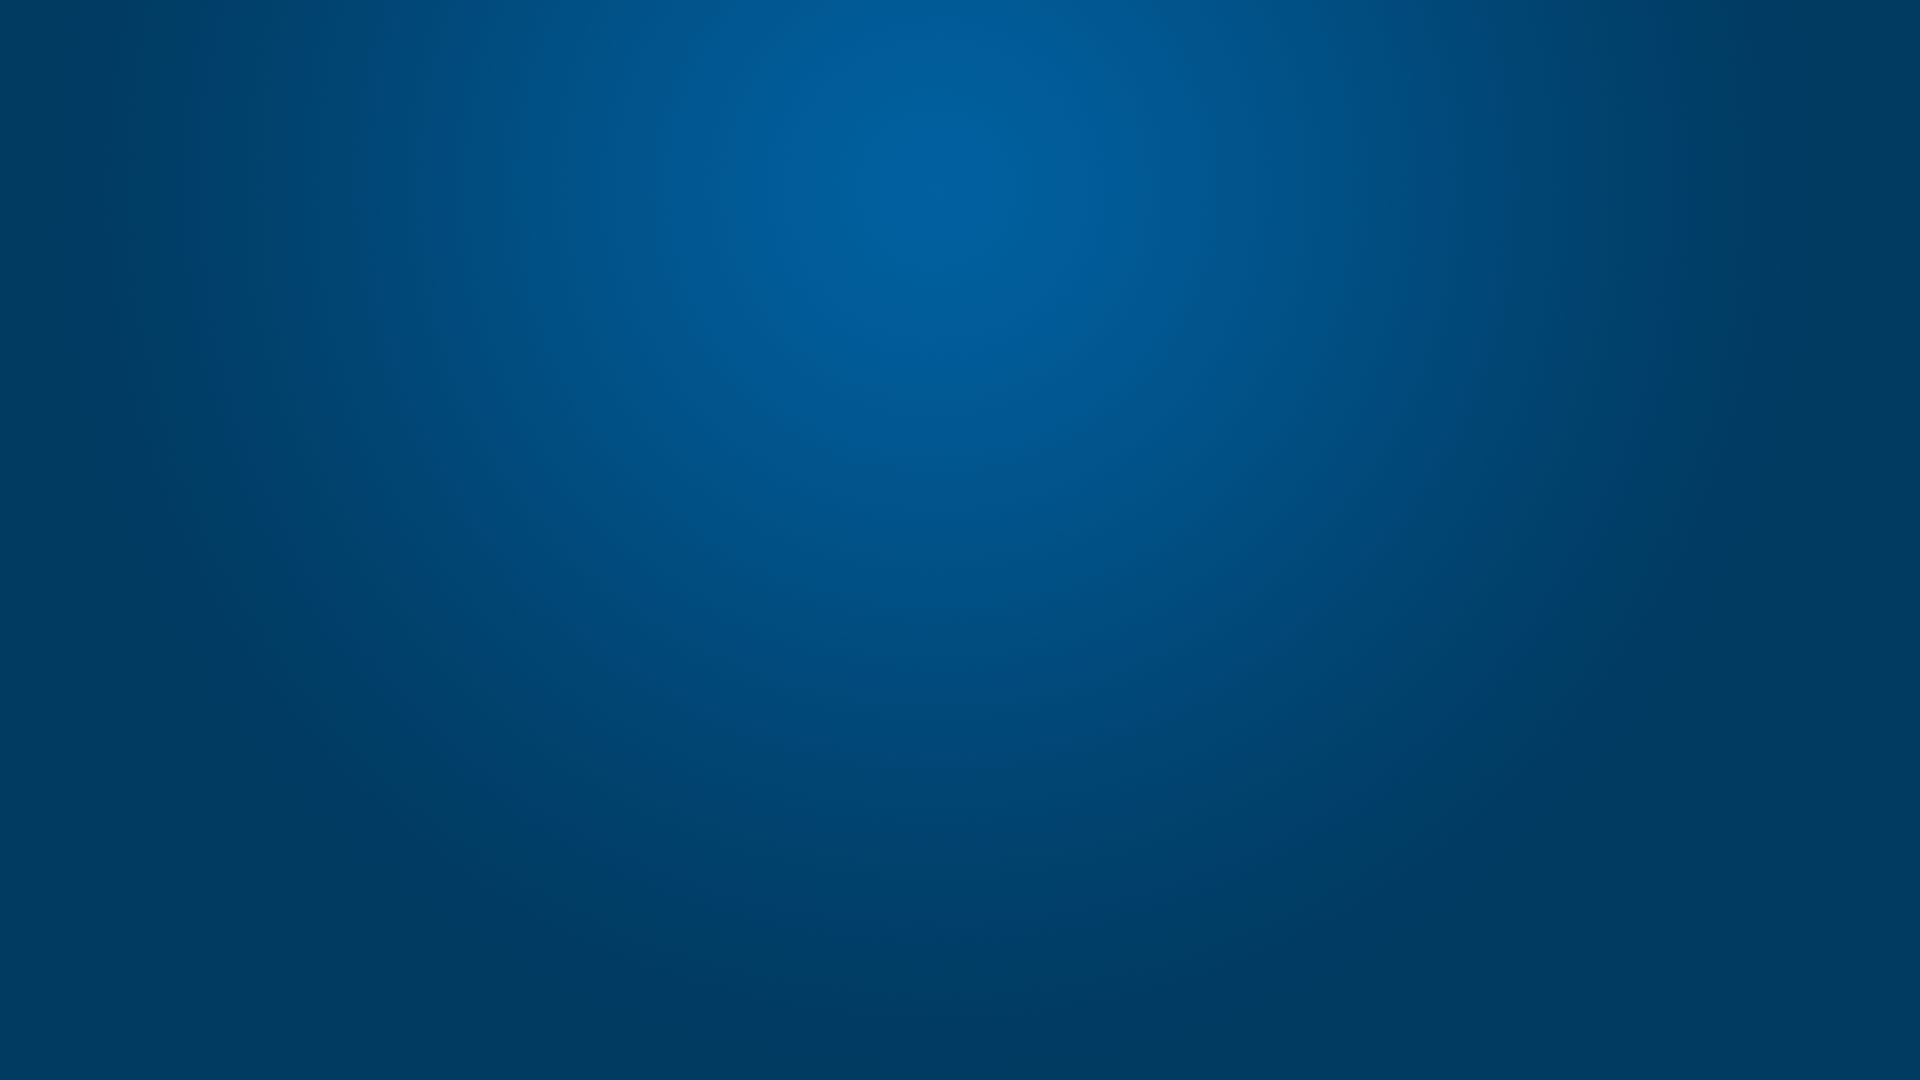 Background Images For Websites Professional Blue Hd